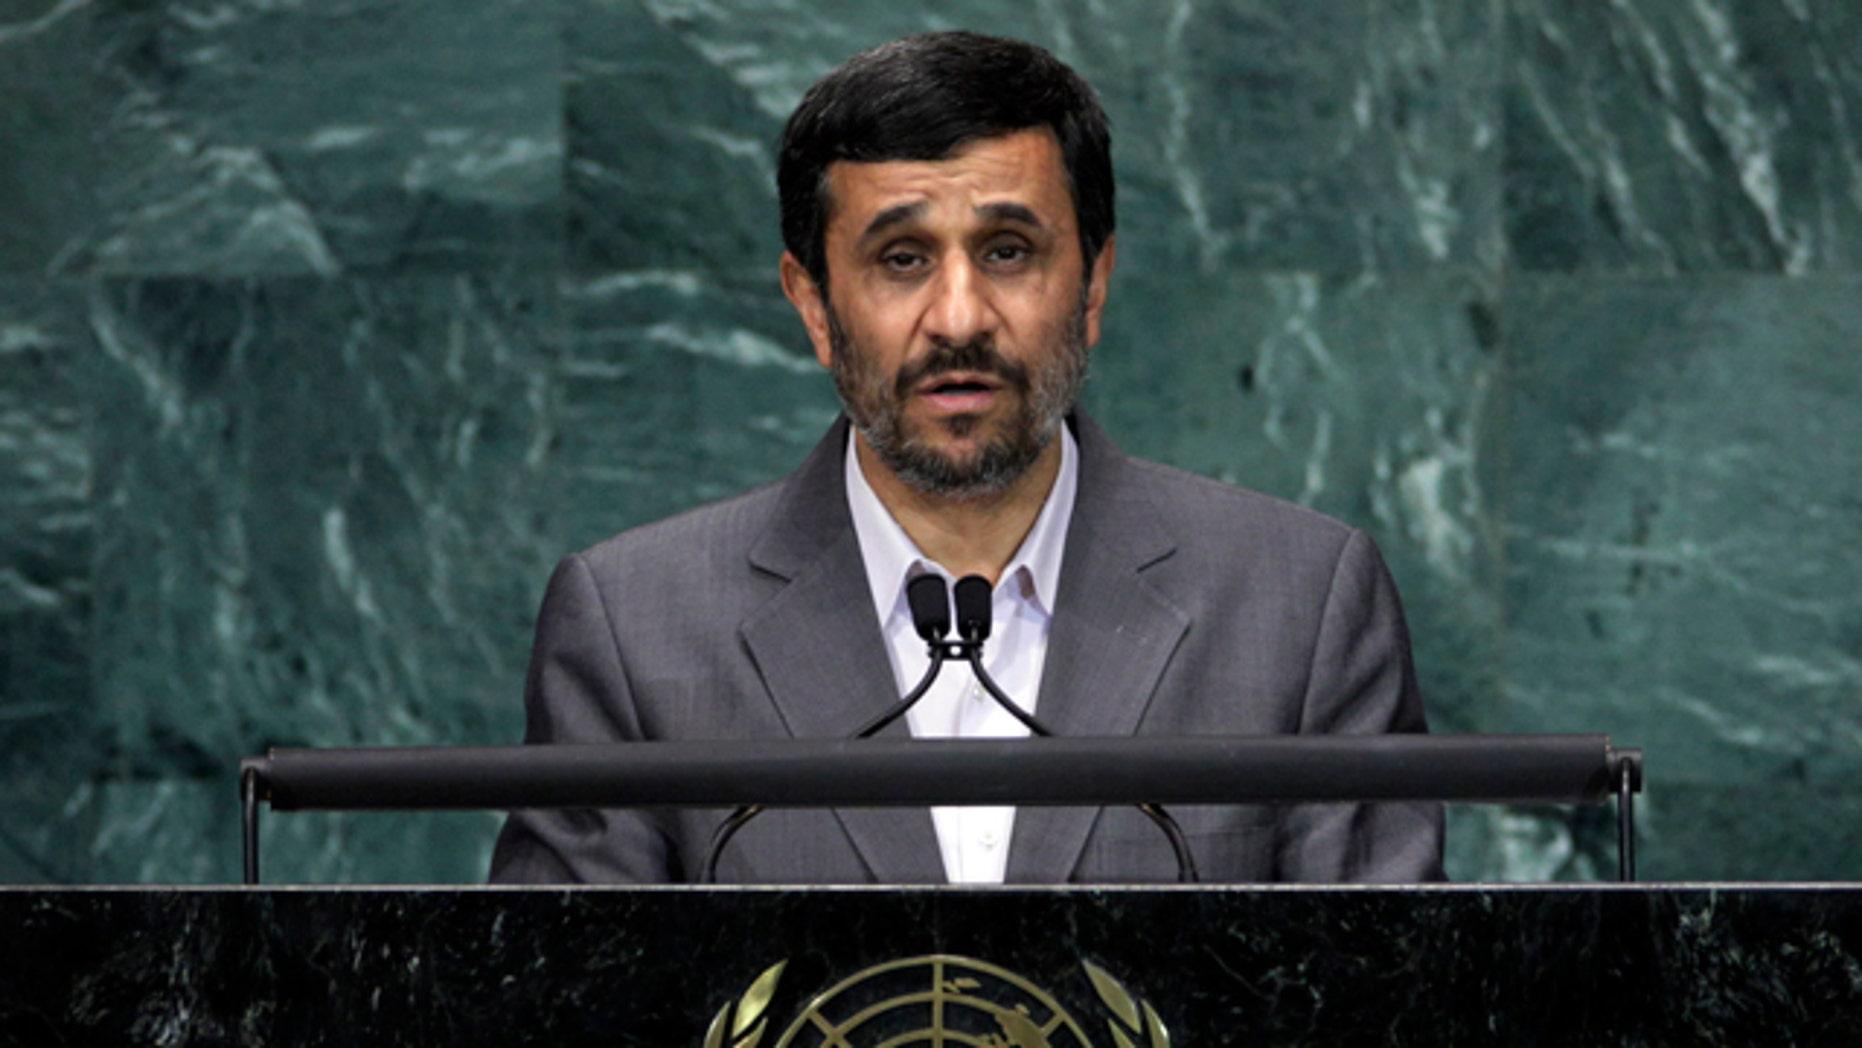 September 21: Mahmoud Ahmadinejad, President of Iran, addresses a summit on the Millennium Development Goals at United Nations headquarters. (AP)